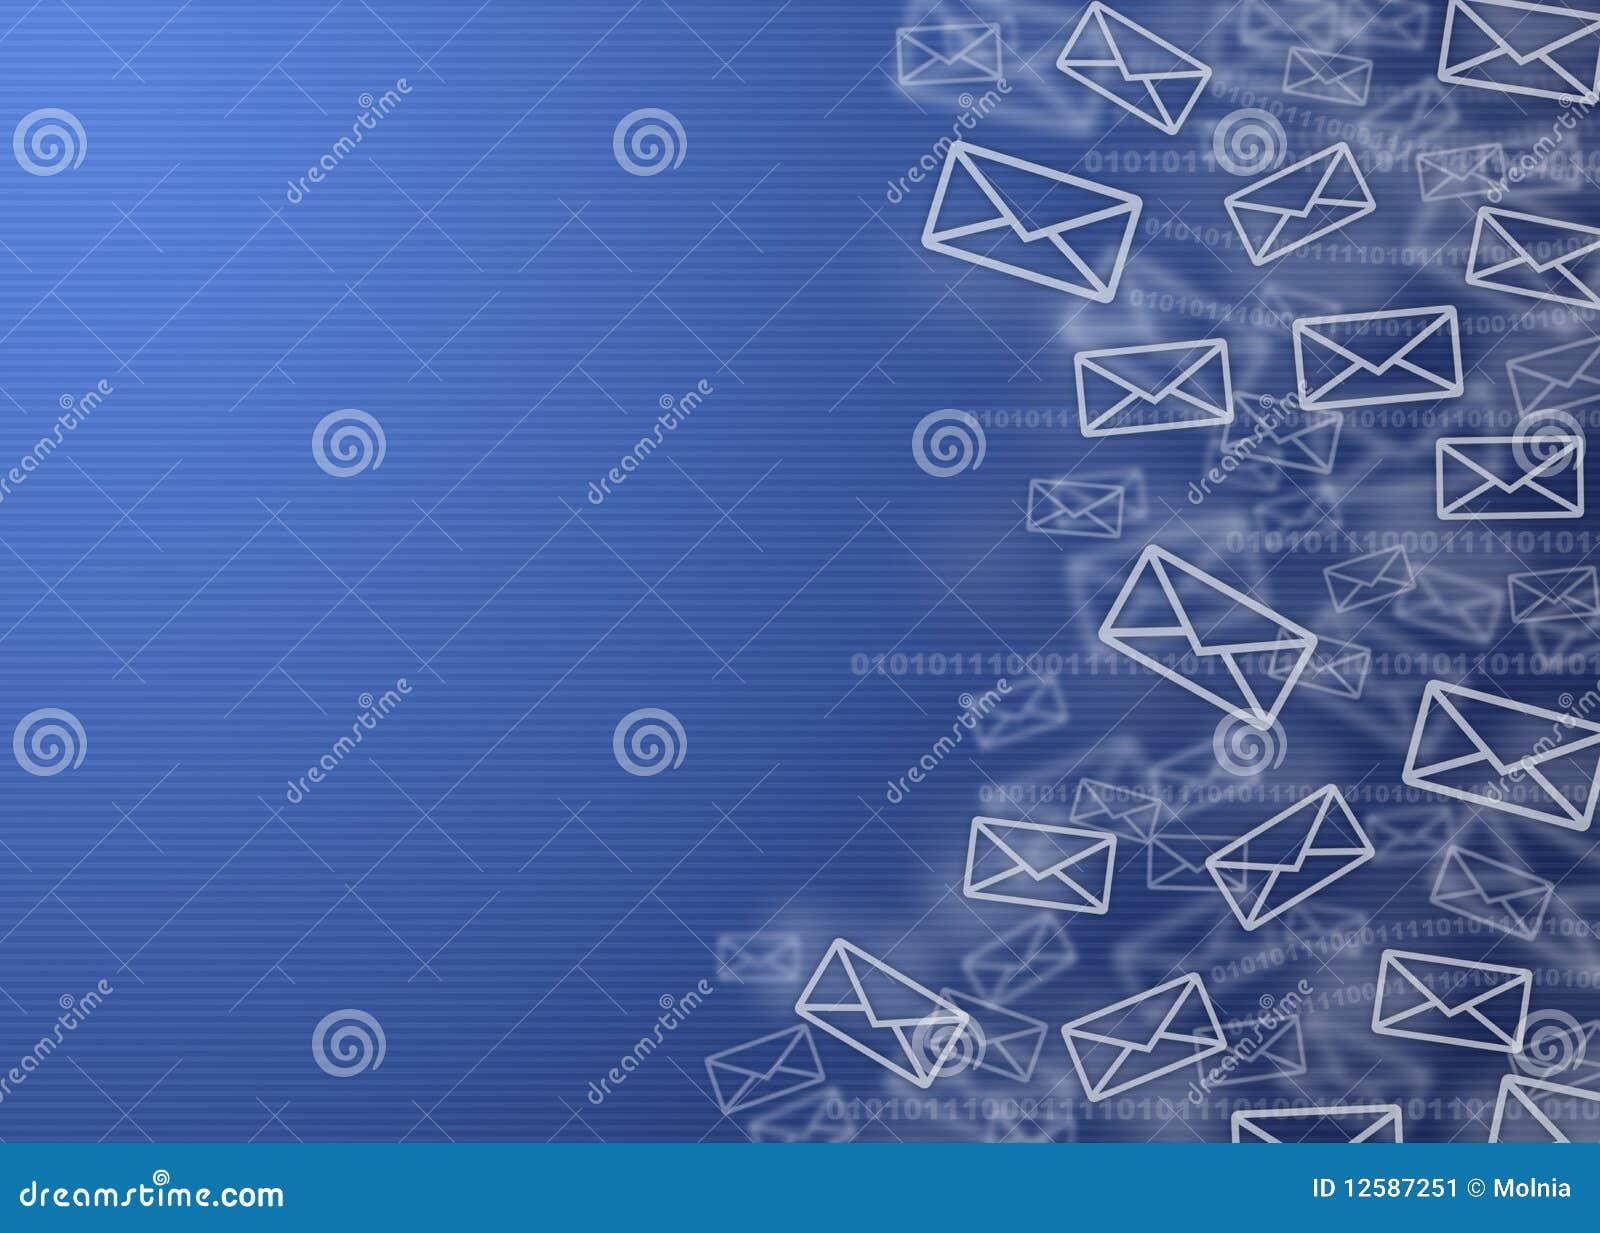 Digital Mail Background Stock Image Image 12587251